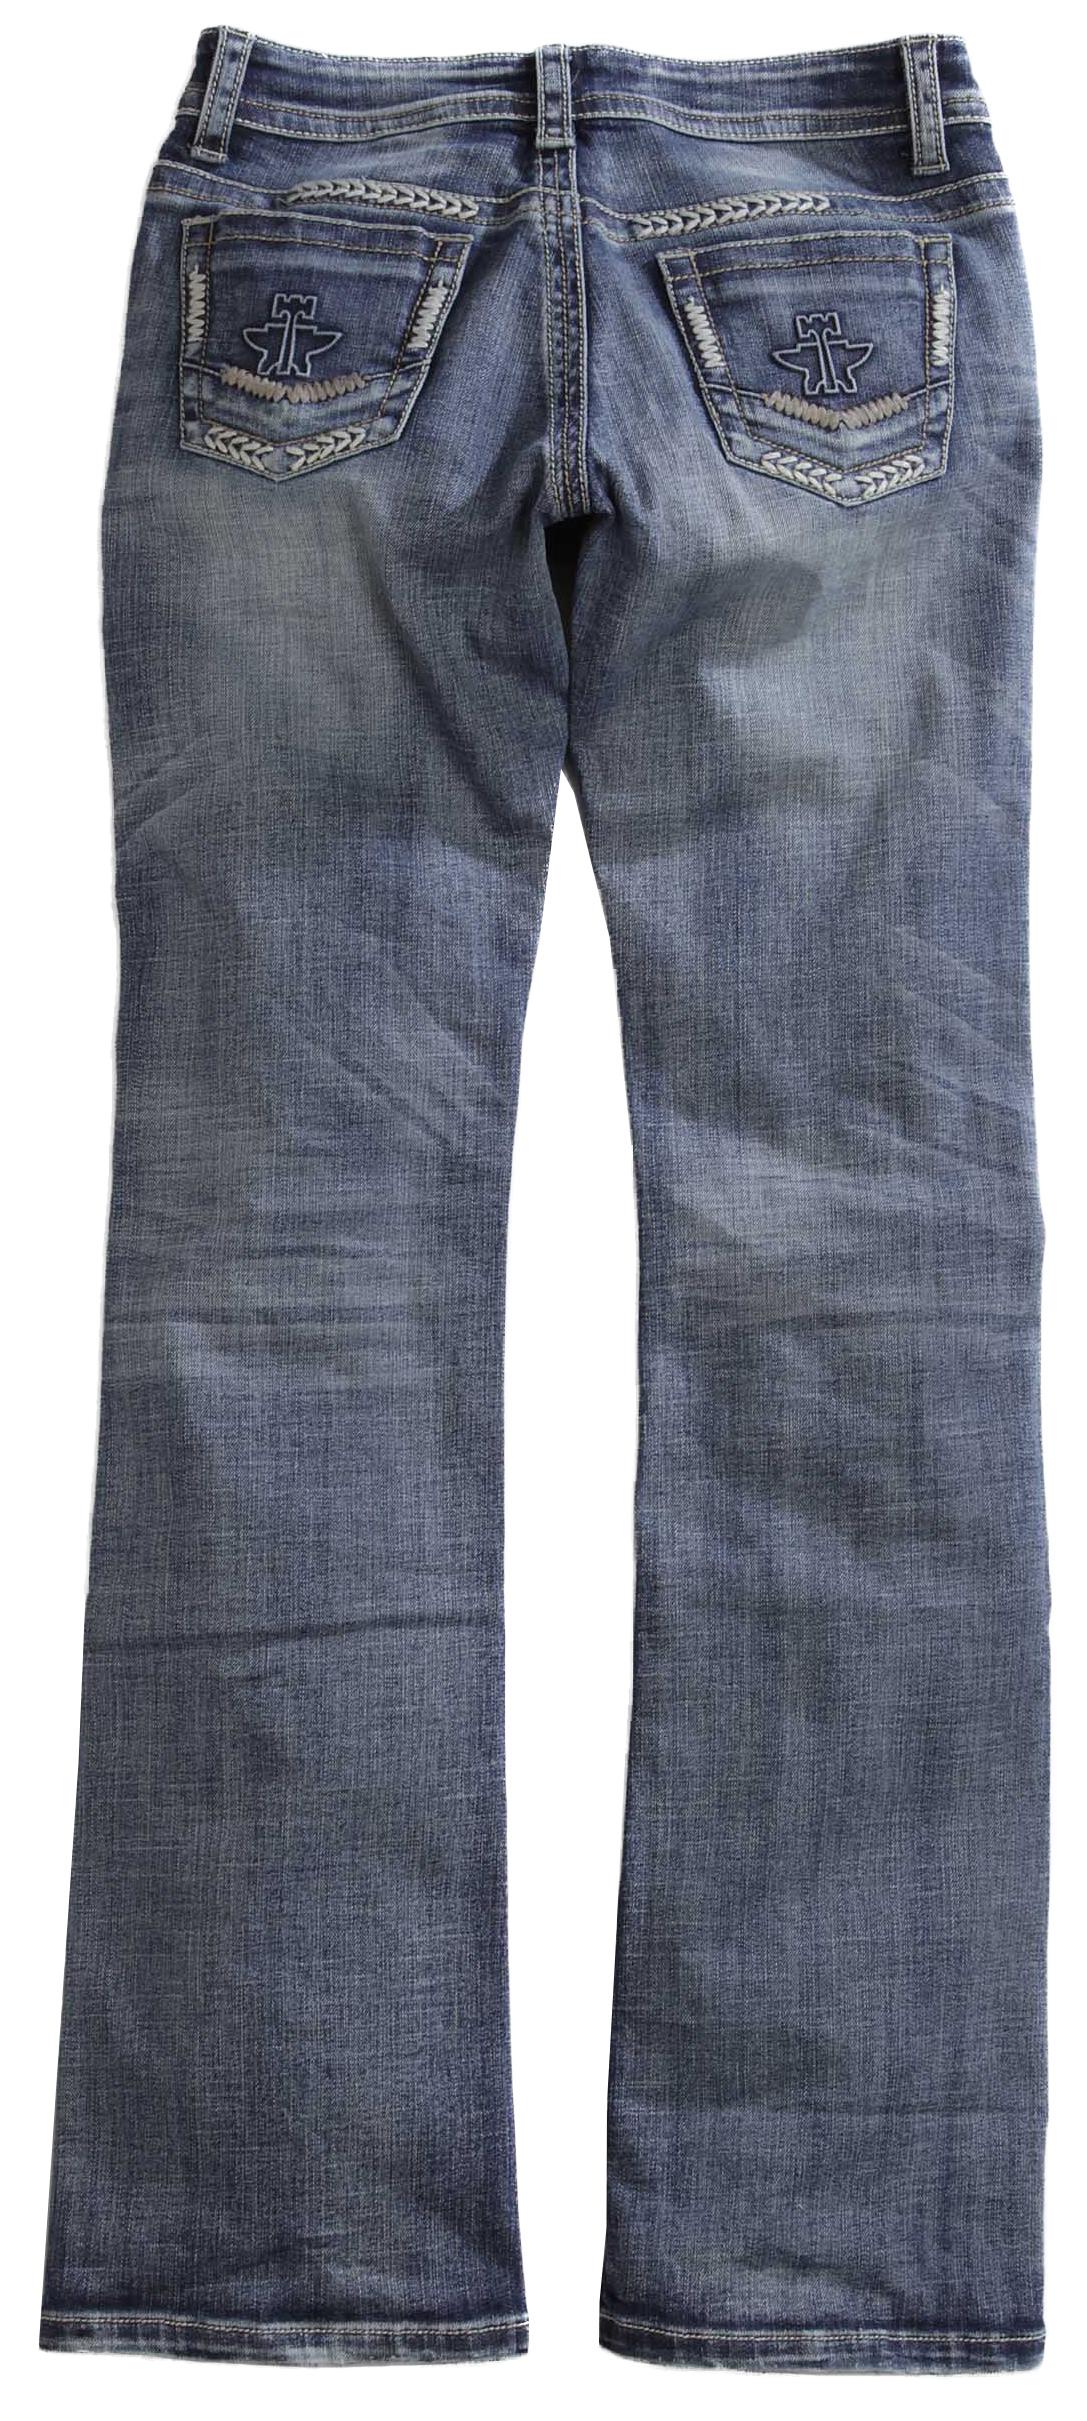 Women's Jeans - Tin Haul - Boot Barn